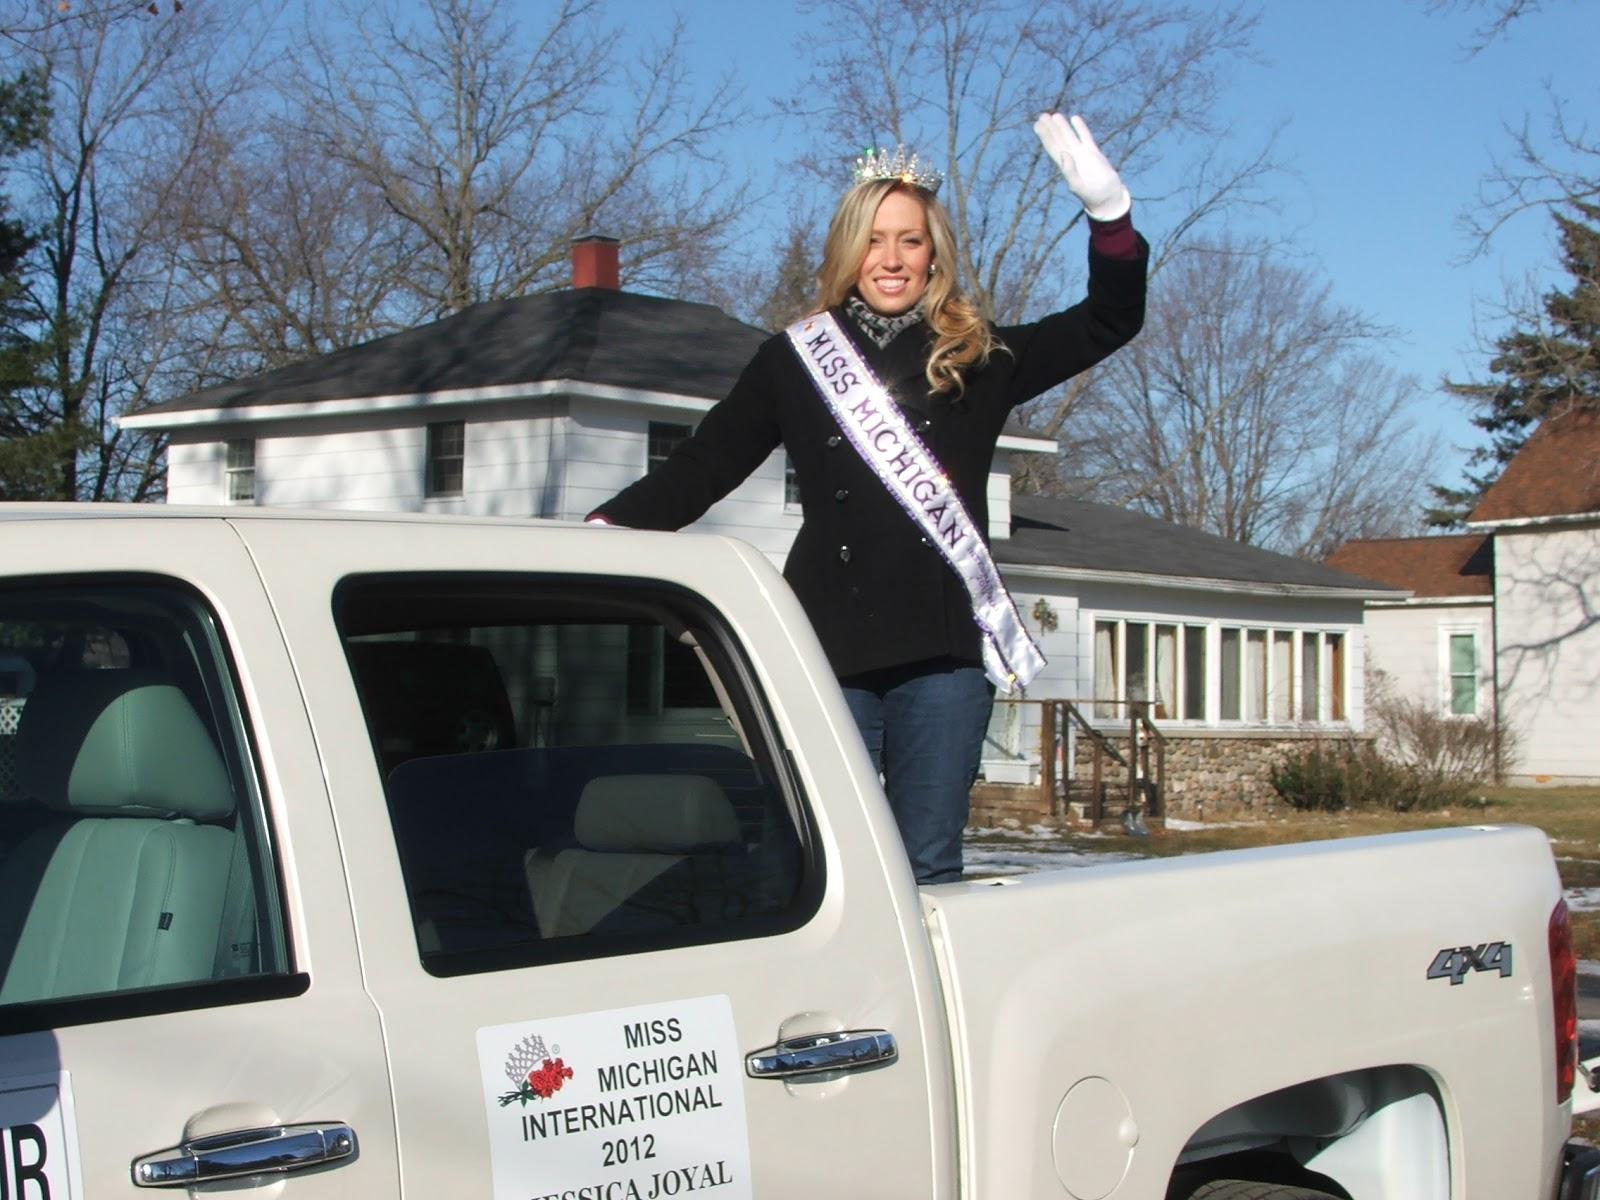 Miss Michigan International 2012: Perchville USA Parade 2012